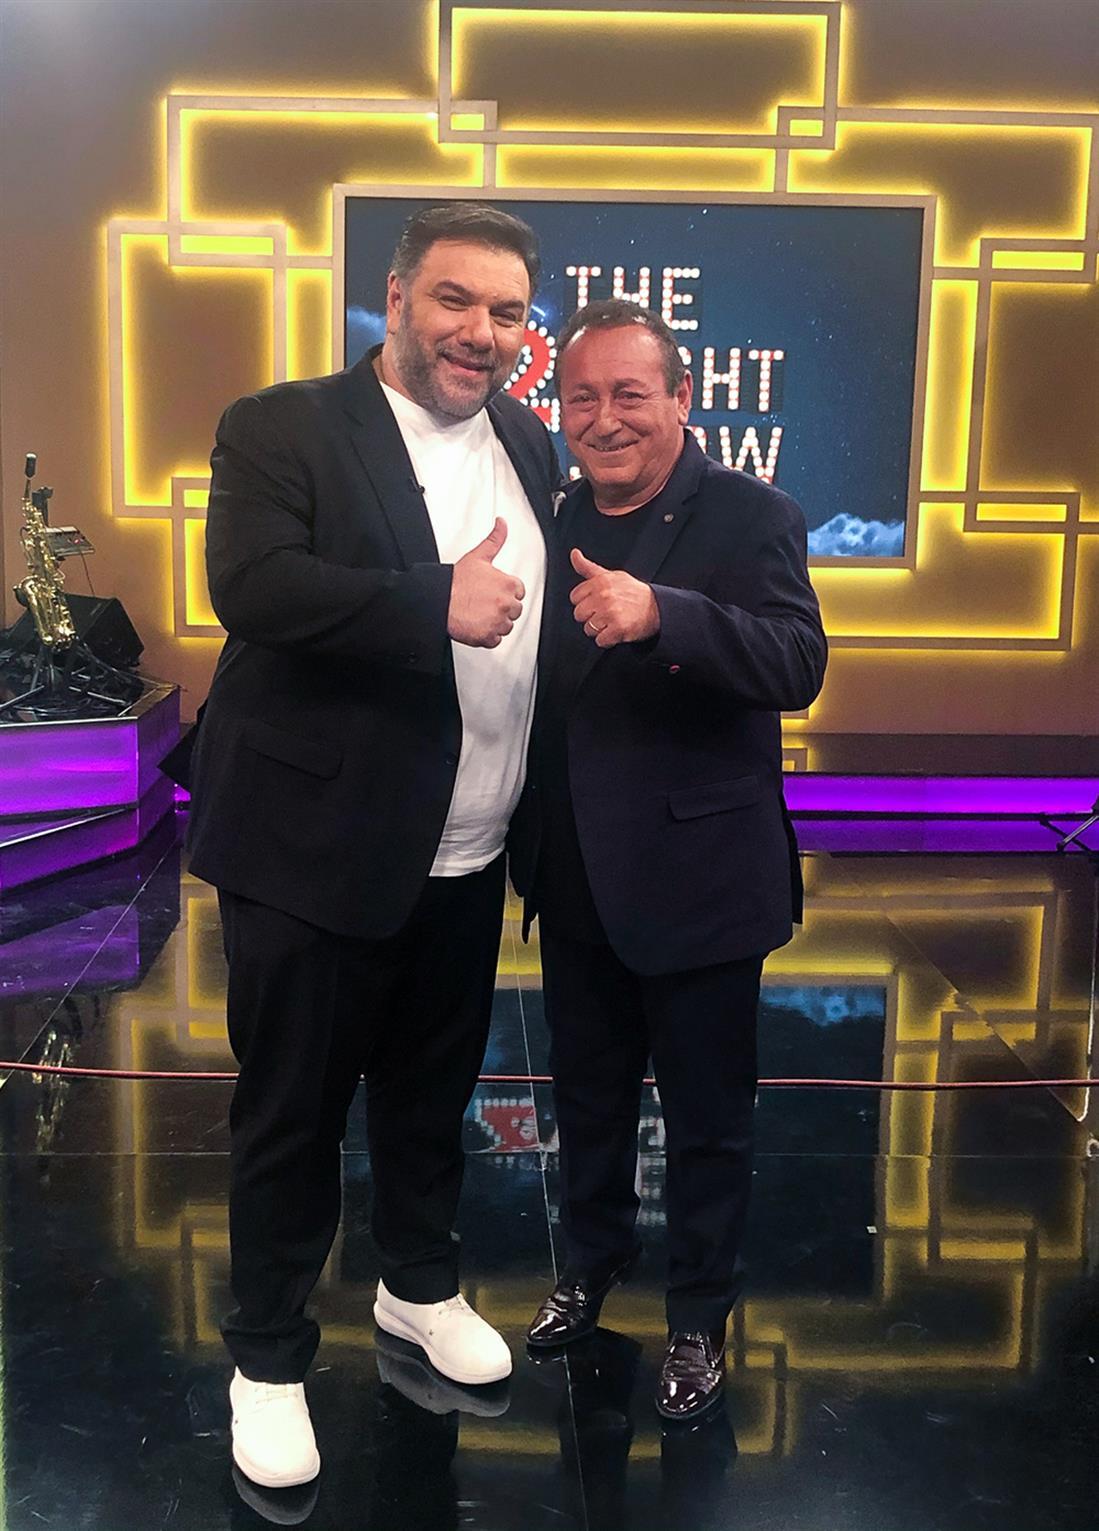 The 2Night Show - Γρηγόρης Αρναούτογλου - Σταύρος Φωτιάδης